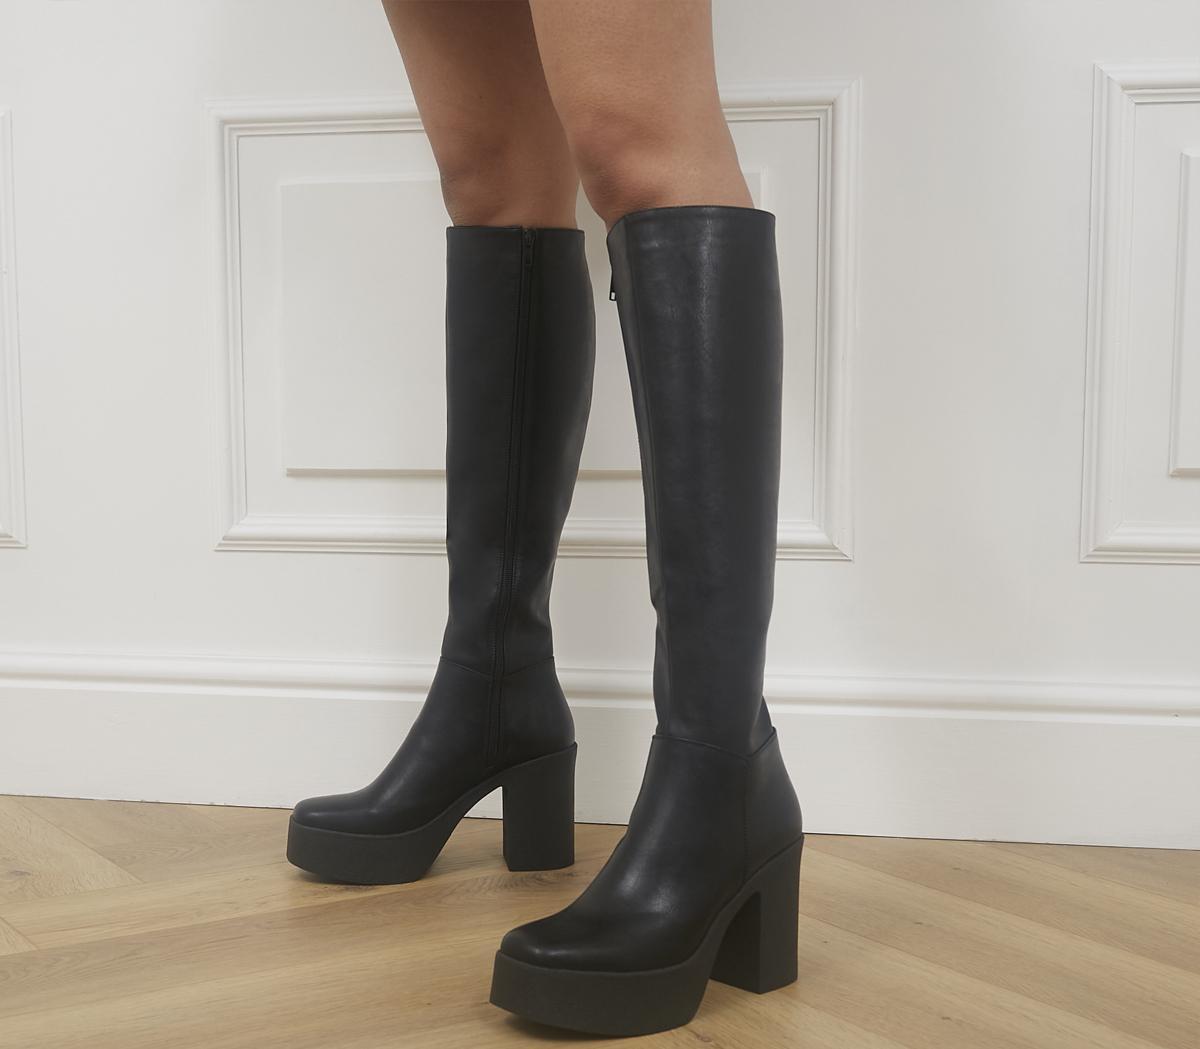 Slick Nicks Knee Hight Platform Boots